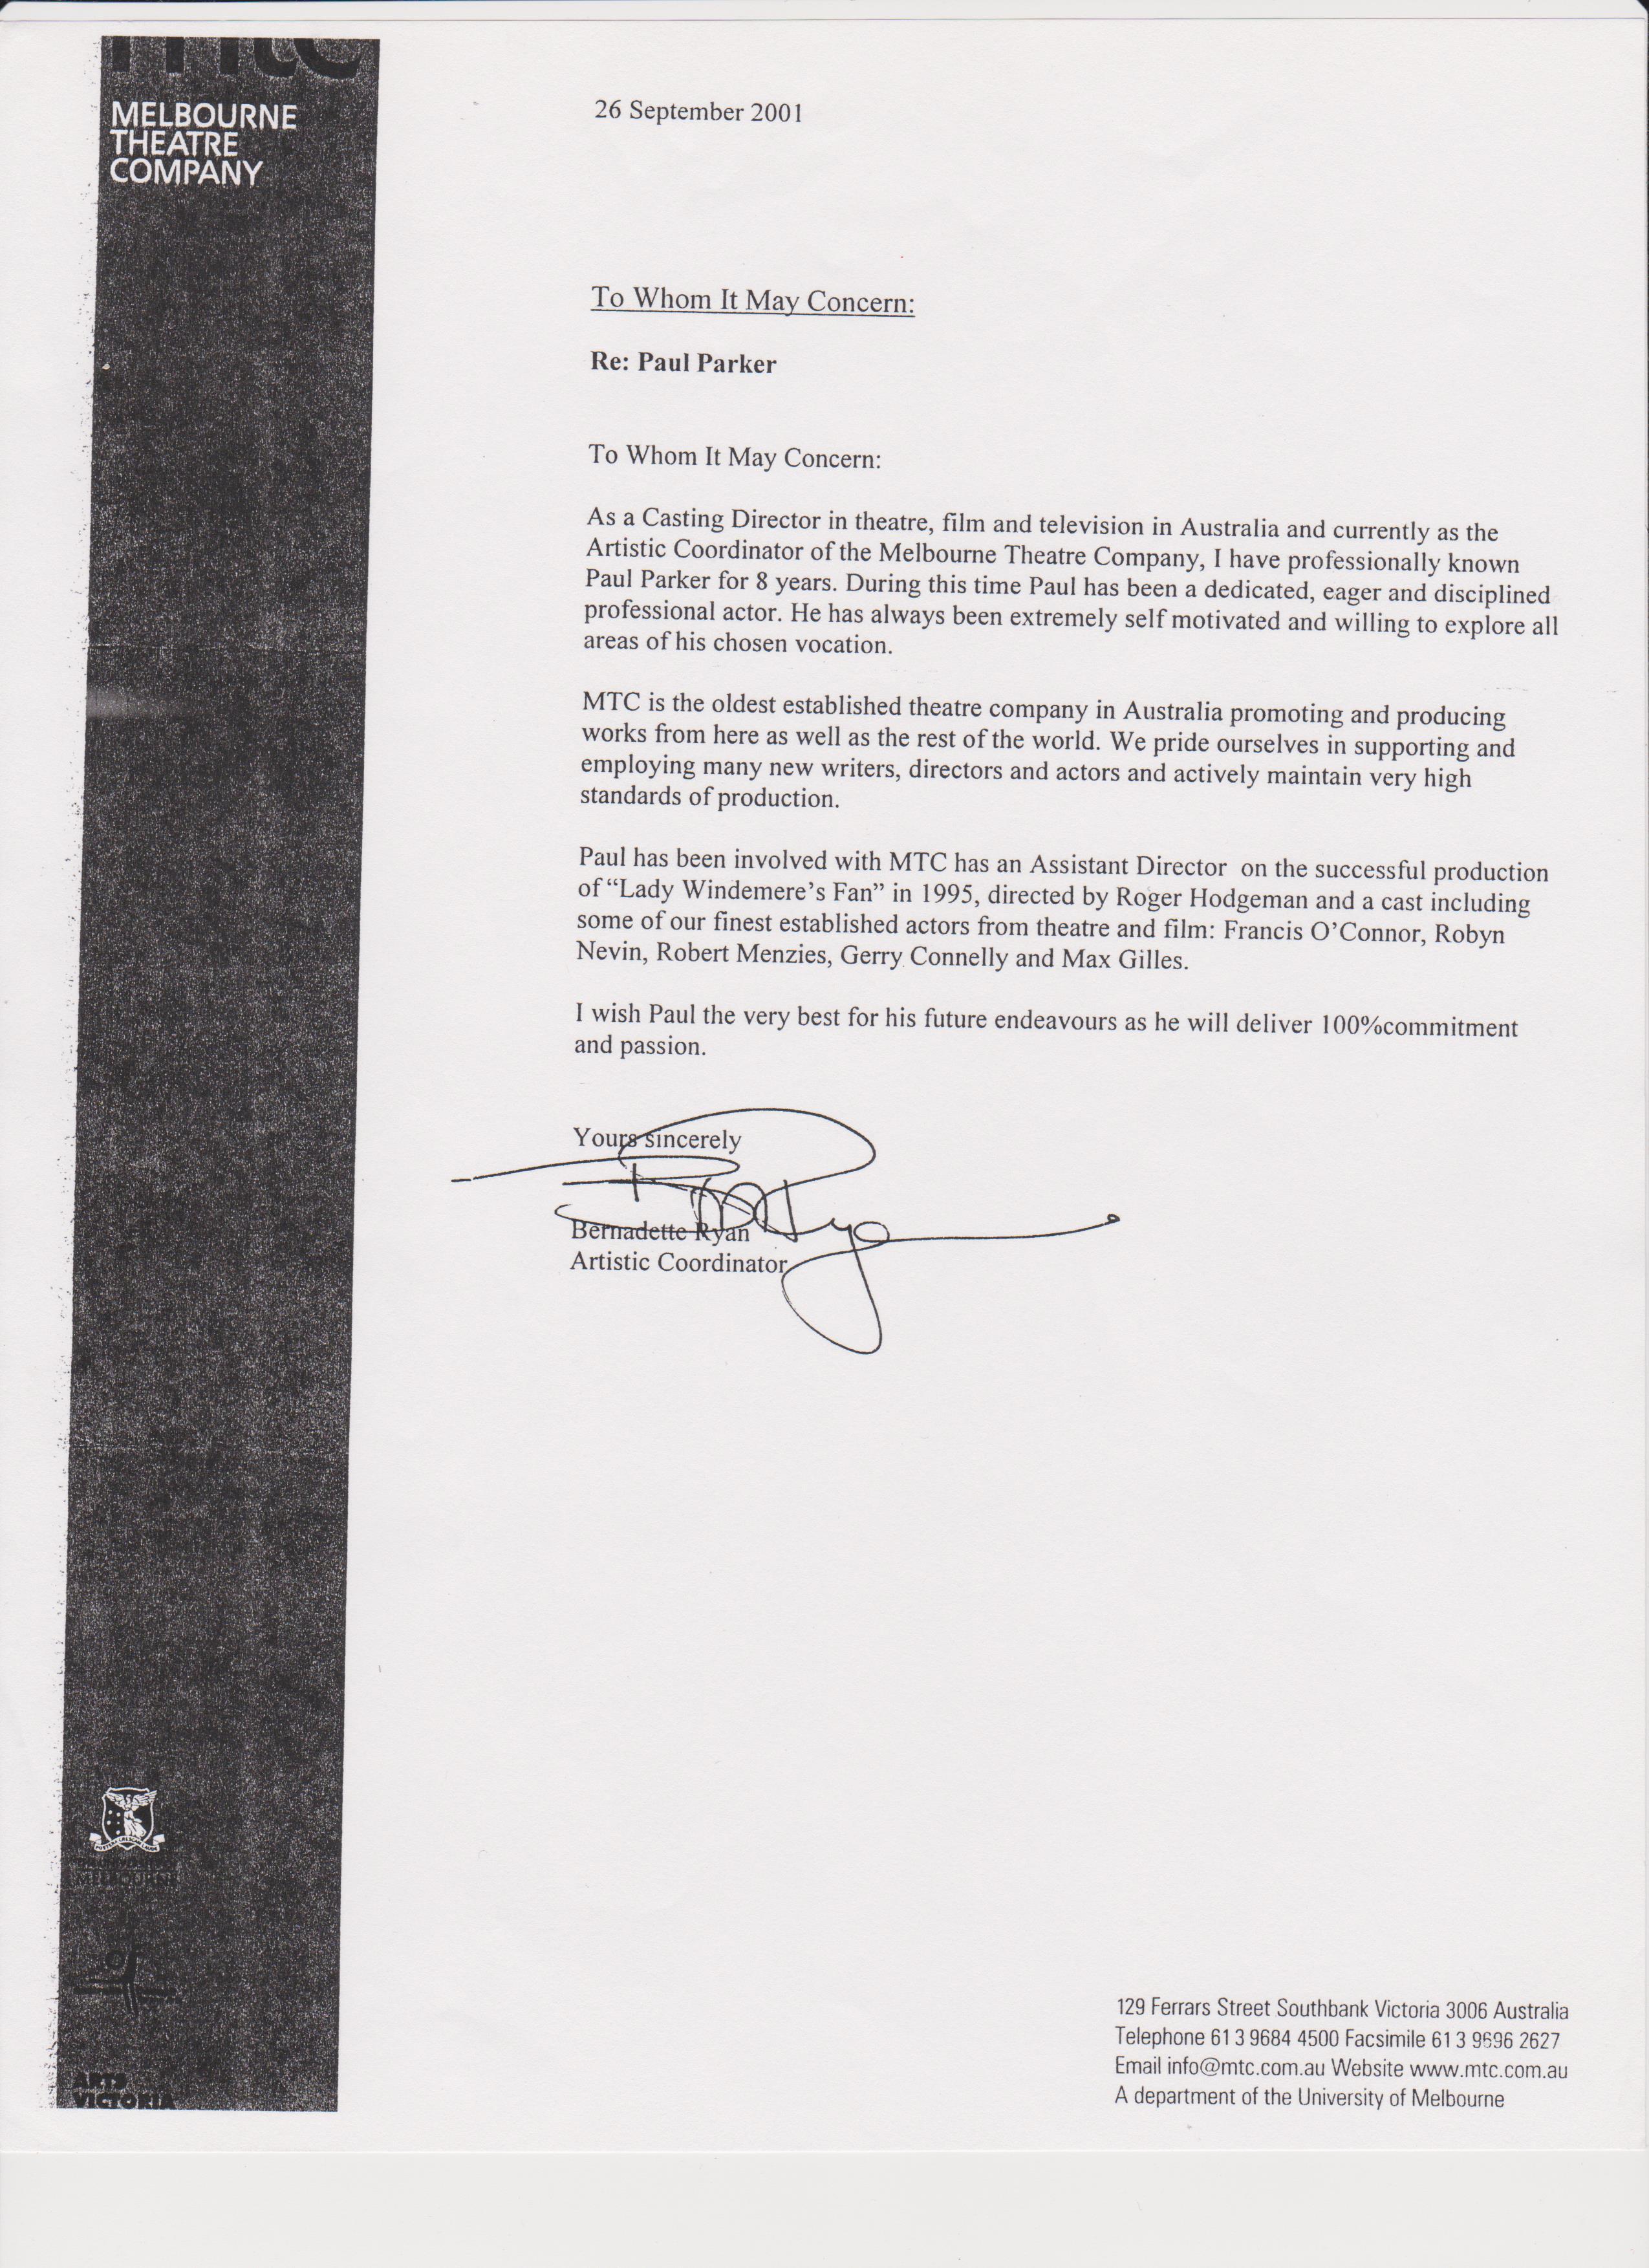 Paul parker performance coaching paul parker resume assistant director to roger hodgman spiritdancerdesigns Images